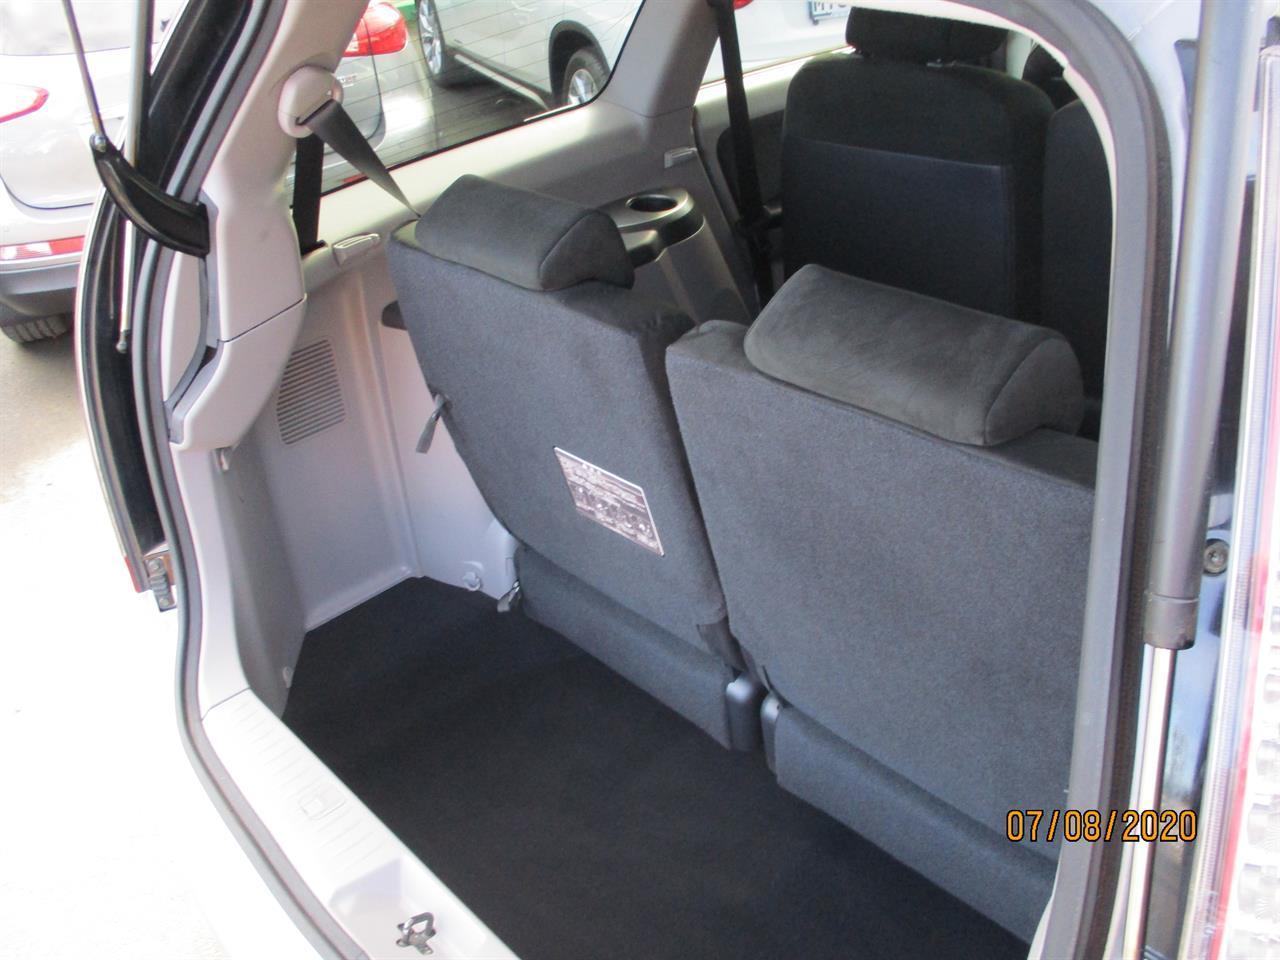 image-7, 2007 Mitsubishi Grandis 2.4 7 seater at Dunedin